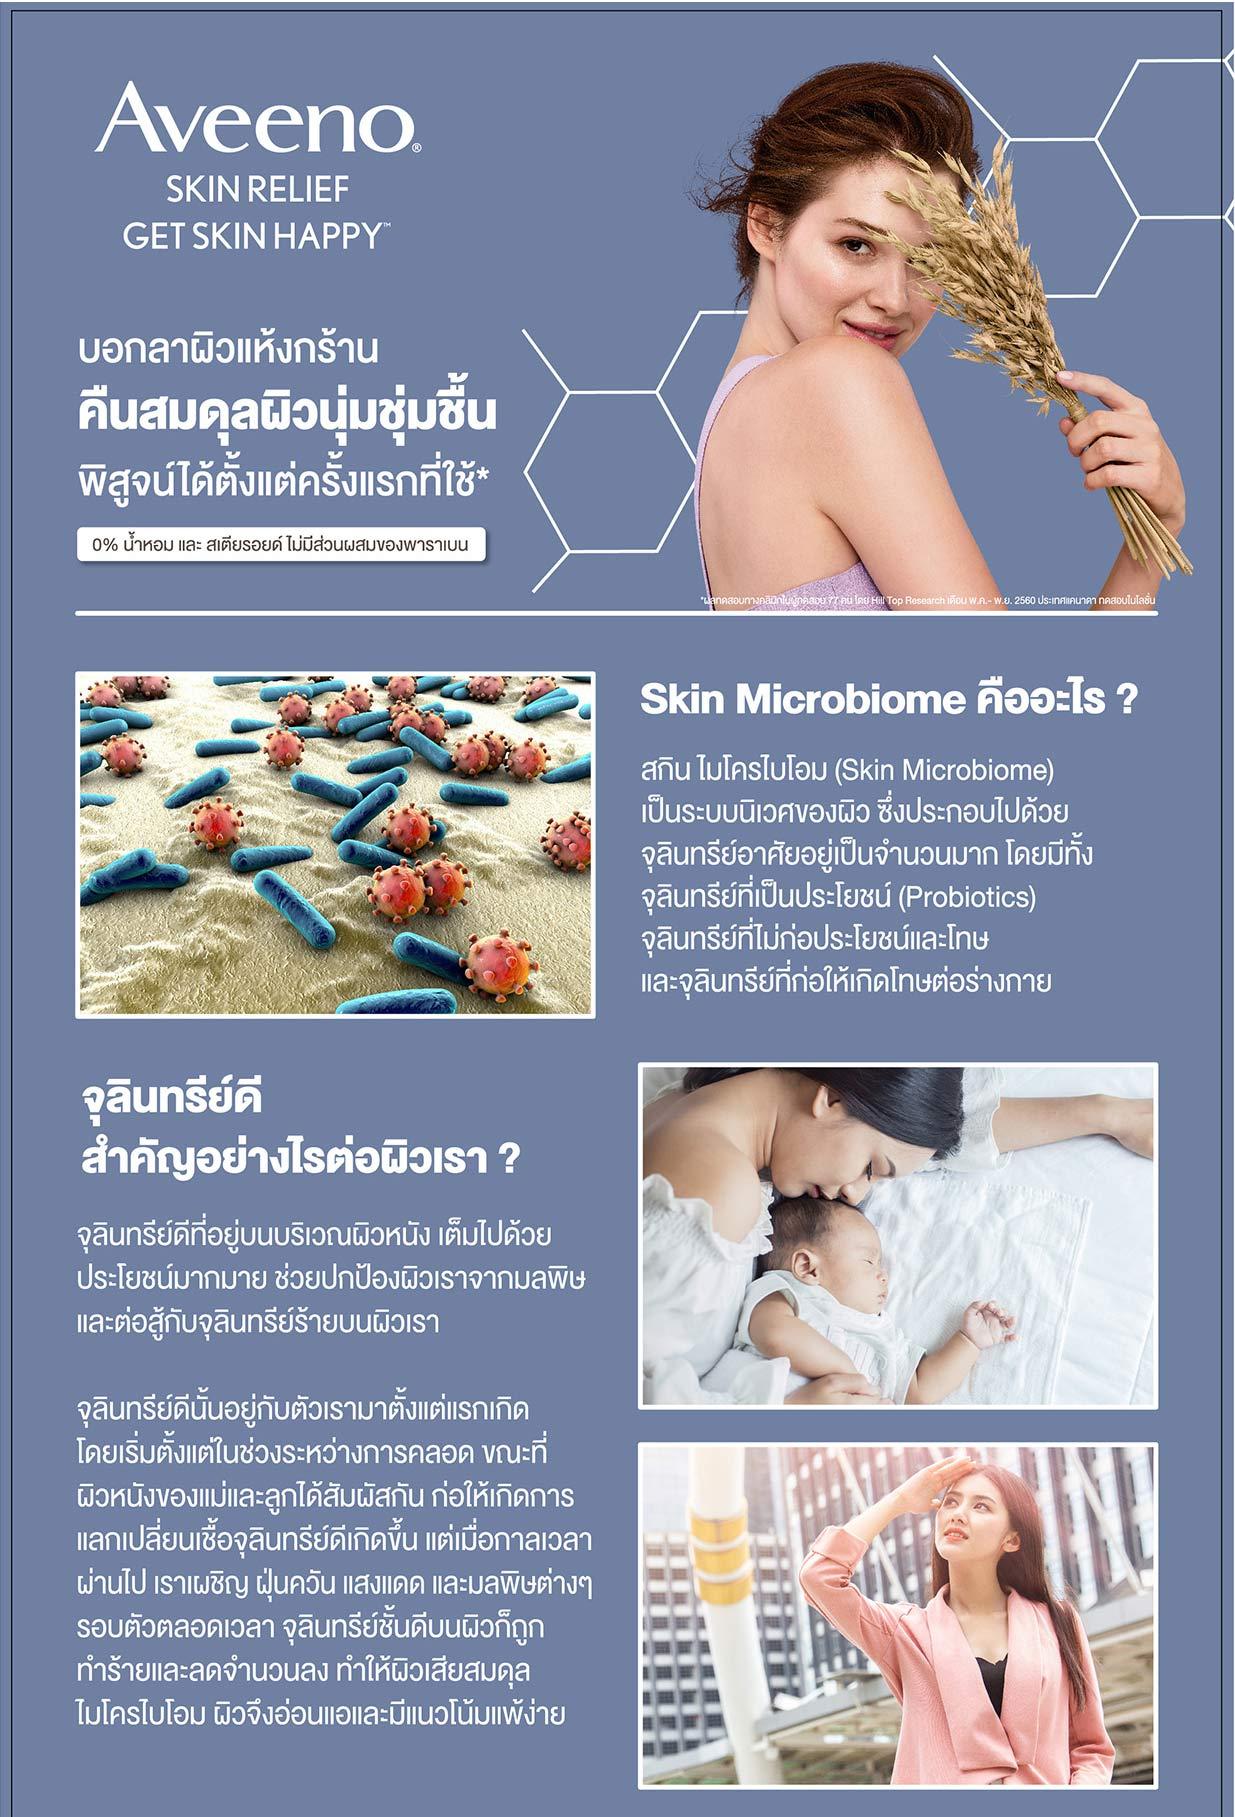 Skin Microbiome คืออะไร? สกิน ไมโครไบโอม (Skin Microbiome) เป็นระบบนิเวศของผิว ซึ่งประกอบไปด้วยจุลินทรีย์อาศัยอยู่เป็นจำนวนมาก โดยมีทั้งจุลินทรีย์ที่เป็นประโยชน์ (Probiotics) จุลินทรีย์ที่ไม่ก่อประโยชน์และโทษ และจุลินทรีย์ที่ก่อให้เกิดโทษต่อร่างกาย จุลินทรีย์ดี สำคัญอย่างไรต่อผิวเรา? จุลินทรีย์ดีที่อยู่บนบริเวณผิวหนัง เต็มไปด้วยประโยชน์มากมาย ช่วยปกป้องผิวเราจากมลพิษและต่อสู้กับจุลินทรีย์ร้ายบนผิวเรา จุลินทรีย์ดีนั้นอยู่กับตัวเรามาตั้งแต่แรกเกิด โดยเริ่มตั้งแต่ในช่วงระหว่างการคลอด ขณะที่ผิวหนังของแม่และลูกได้สัมผัสกัน ก่อให้เกิดการแลกเปลี่ยนเชื้อจุลินทรีย์ดีเกิดขึ้น แต่ เมื่อกาลเวลาผ่านไป เราเผชิญ ฝุ่นควัน แสงแดด และมลพิษต่างๆรอบตัวตลอดเวลา จุลินทรีย์ชั้นดีบนผิวก็ถูกทำร้ายและลดจำนวนลง ทำให้ผิวเสียสมดุลไมโครไบโอม ผิวจึงอ่อนแอและแพ้ง่าย